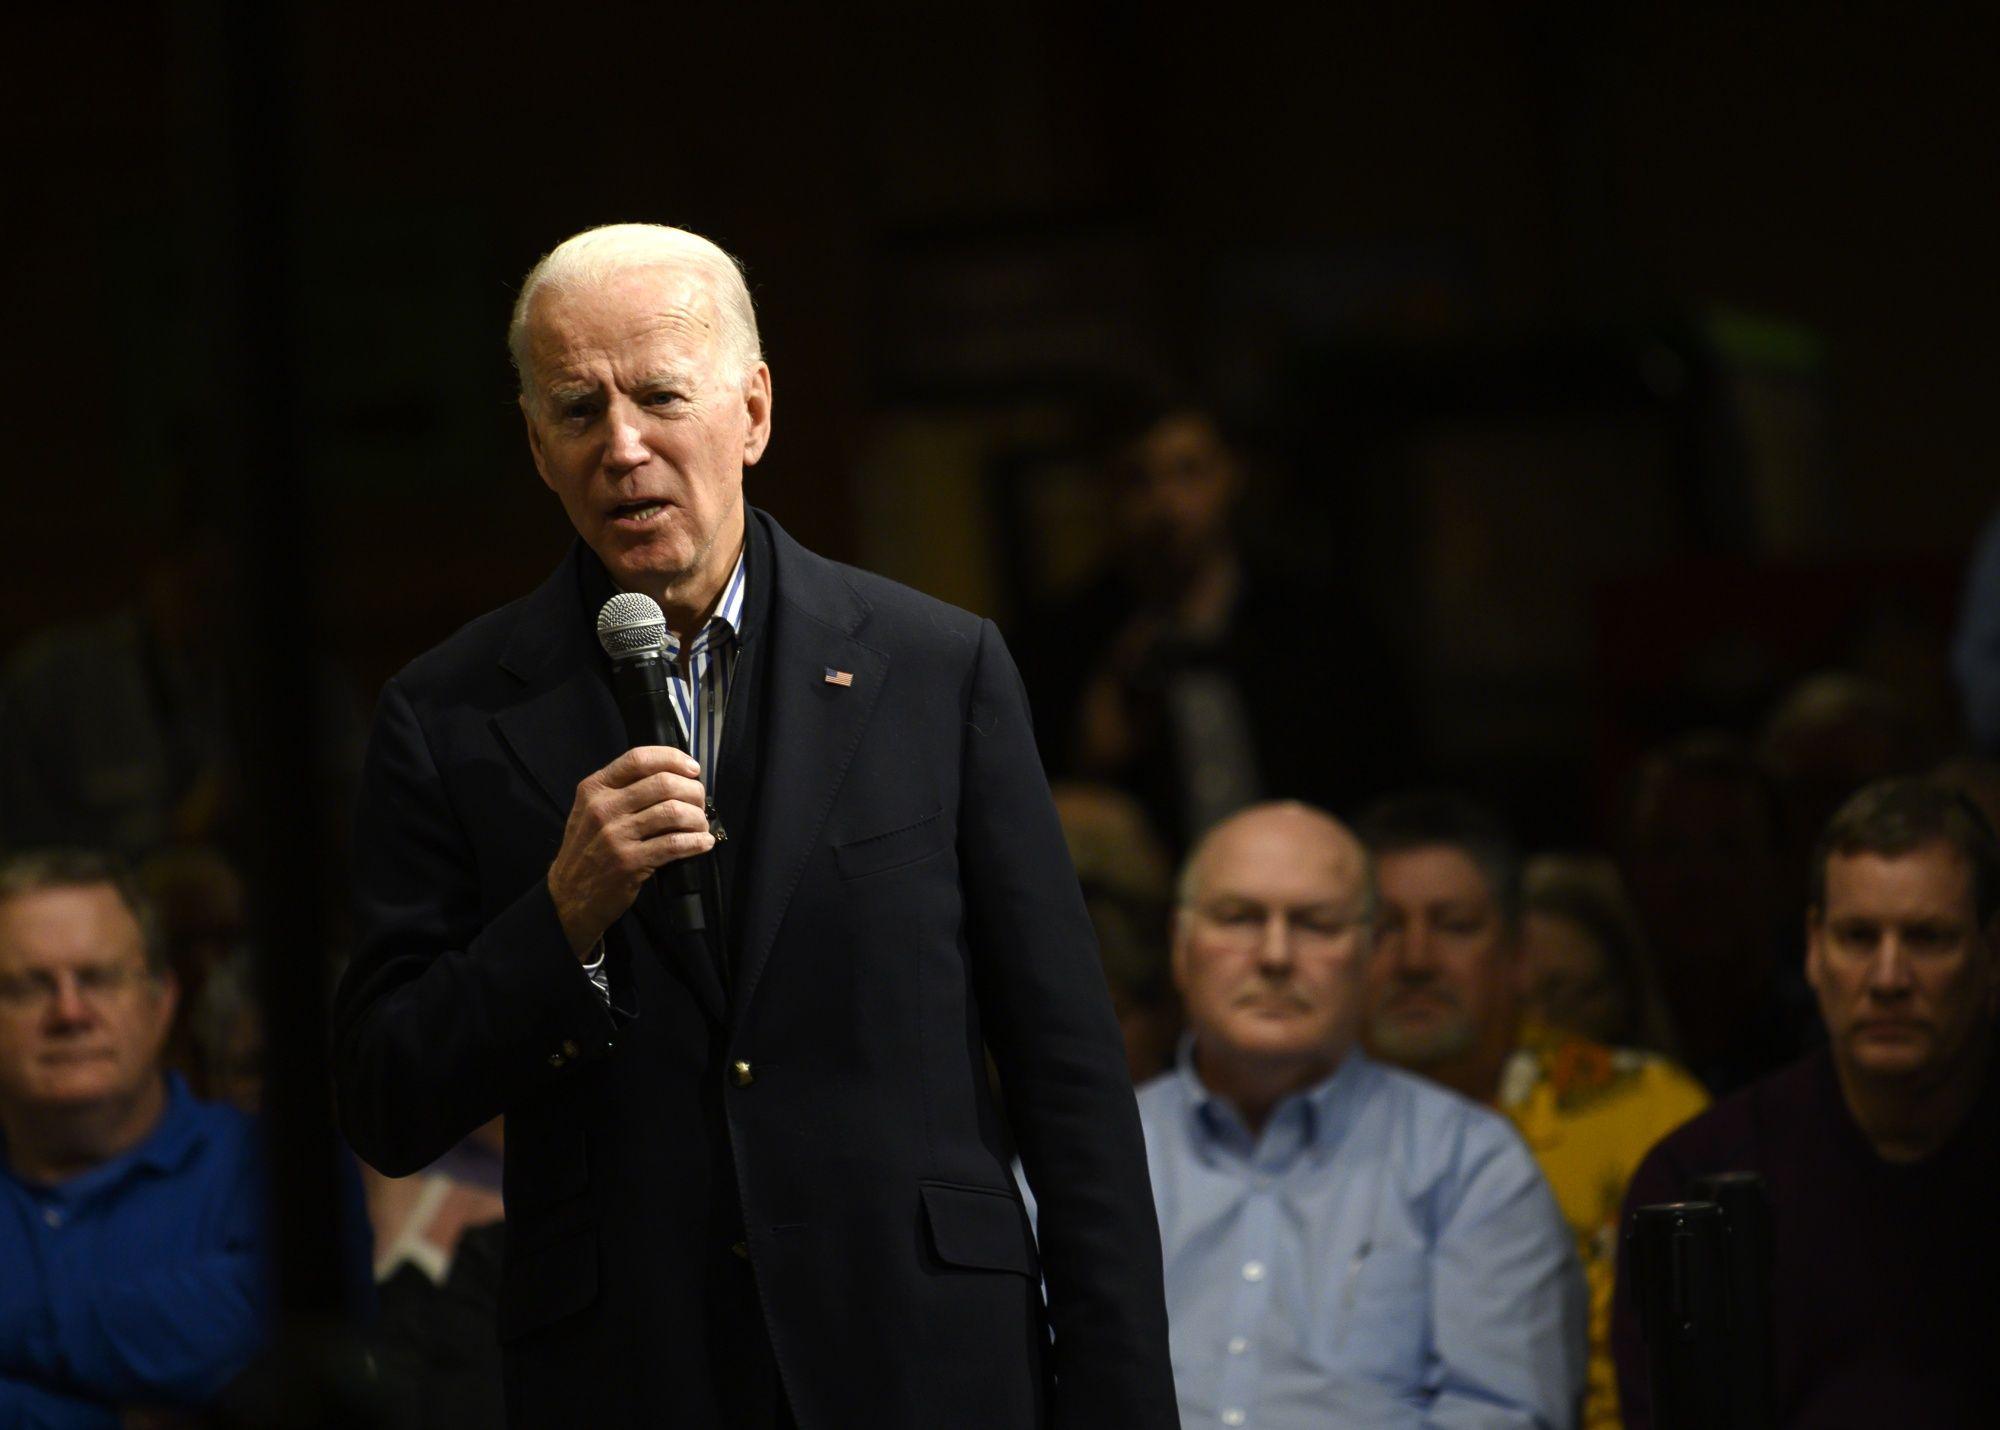 Biden Defends Foreign Policy Record Amid Trump's Iran Threats